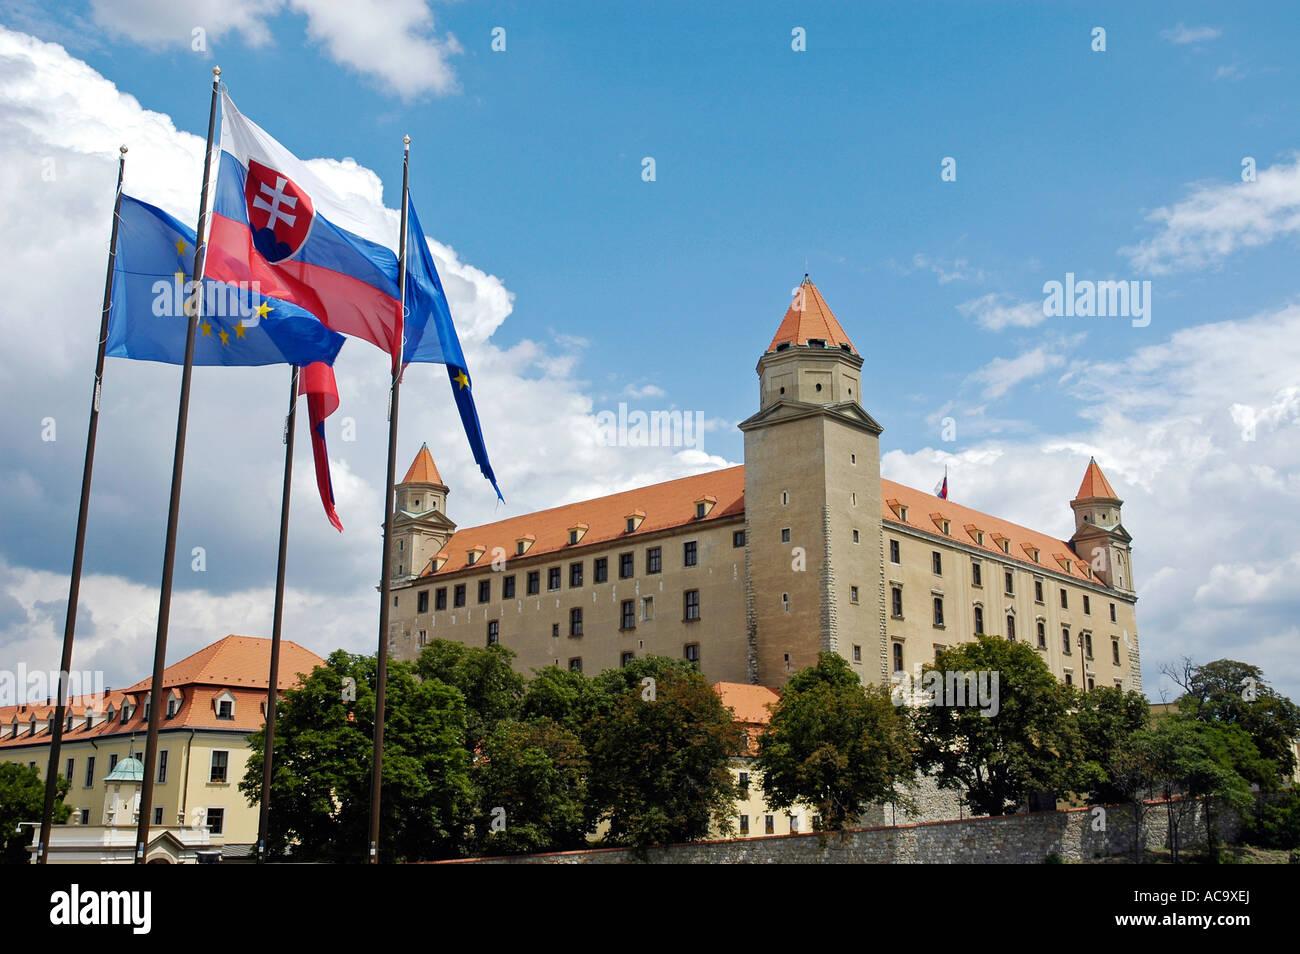 Slovak and European Union flags, Bratislava castle, Bratislava, Slovakia - Stock Image